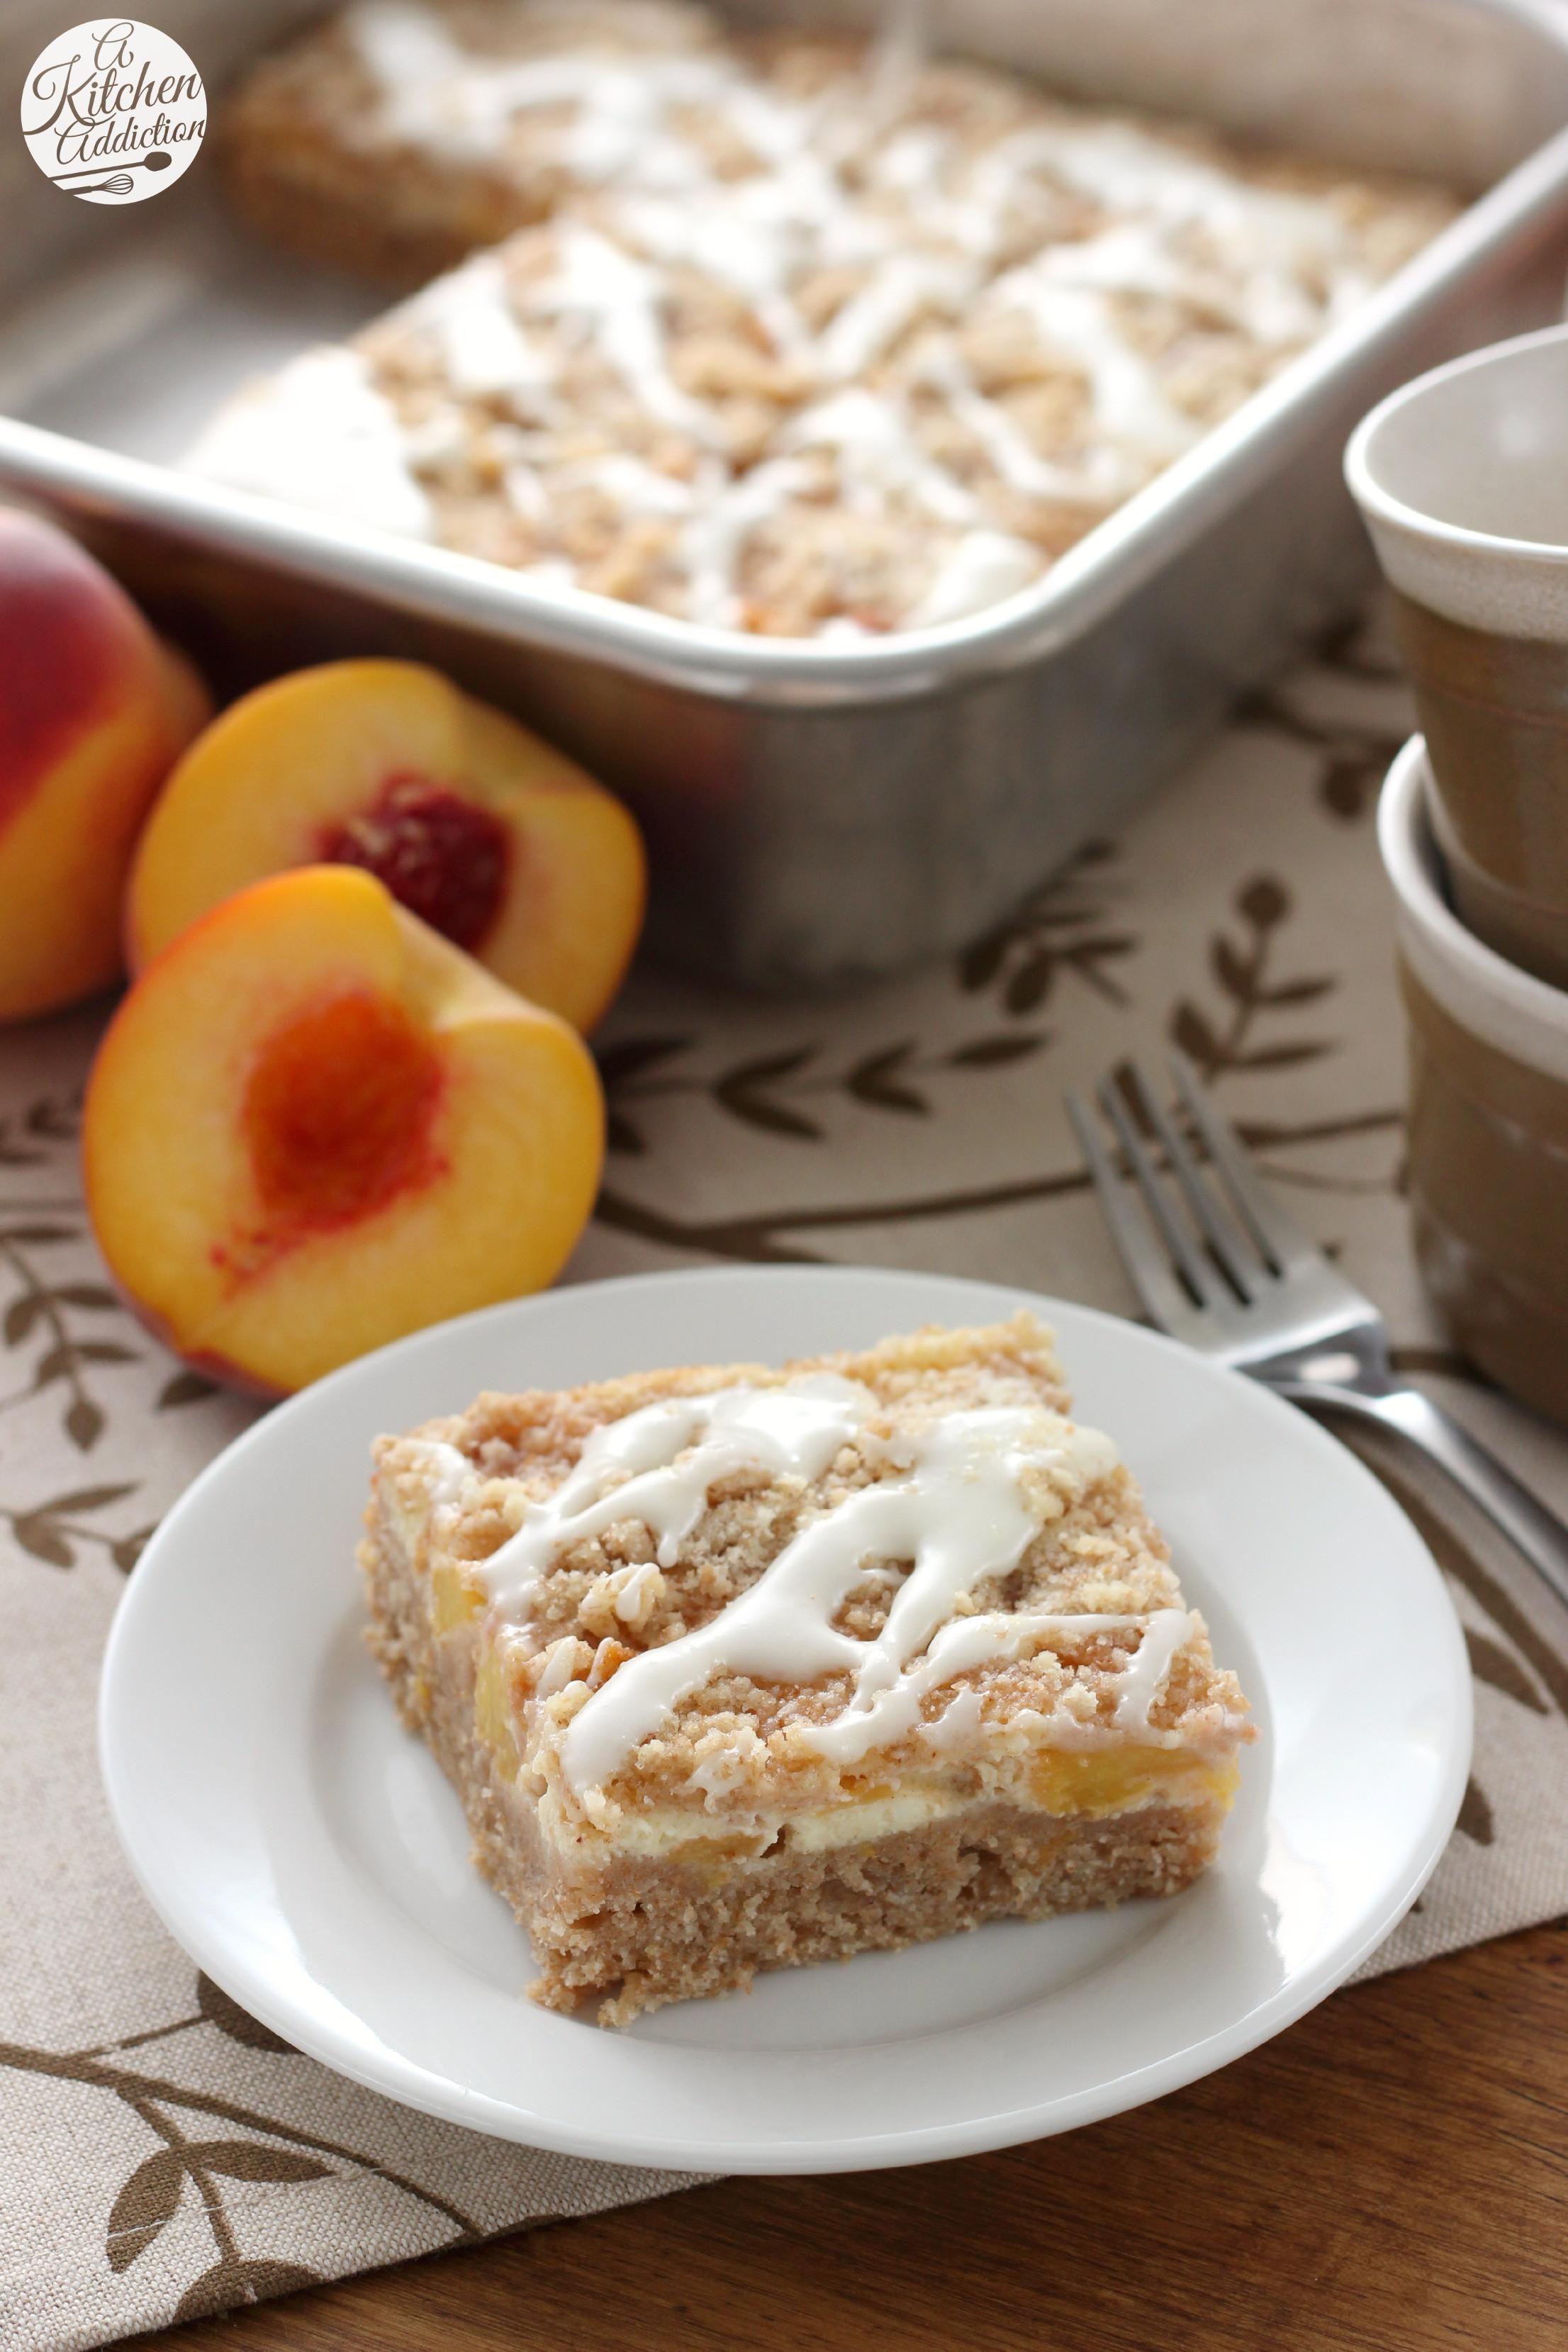 Cream Cheese Coffee Cake  Peaches and Cream Cheese Coffee Cake A Kitchen Addiction